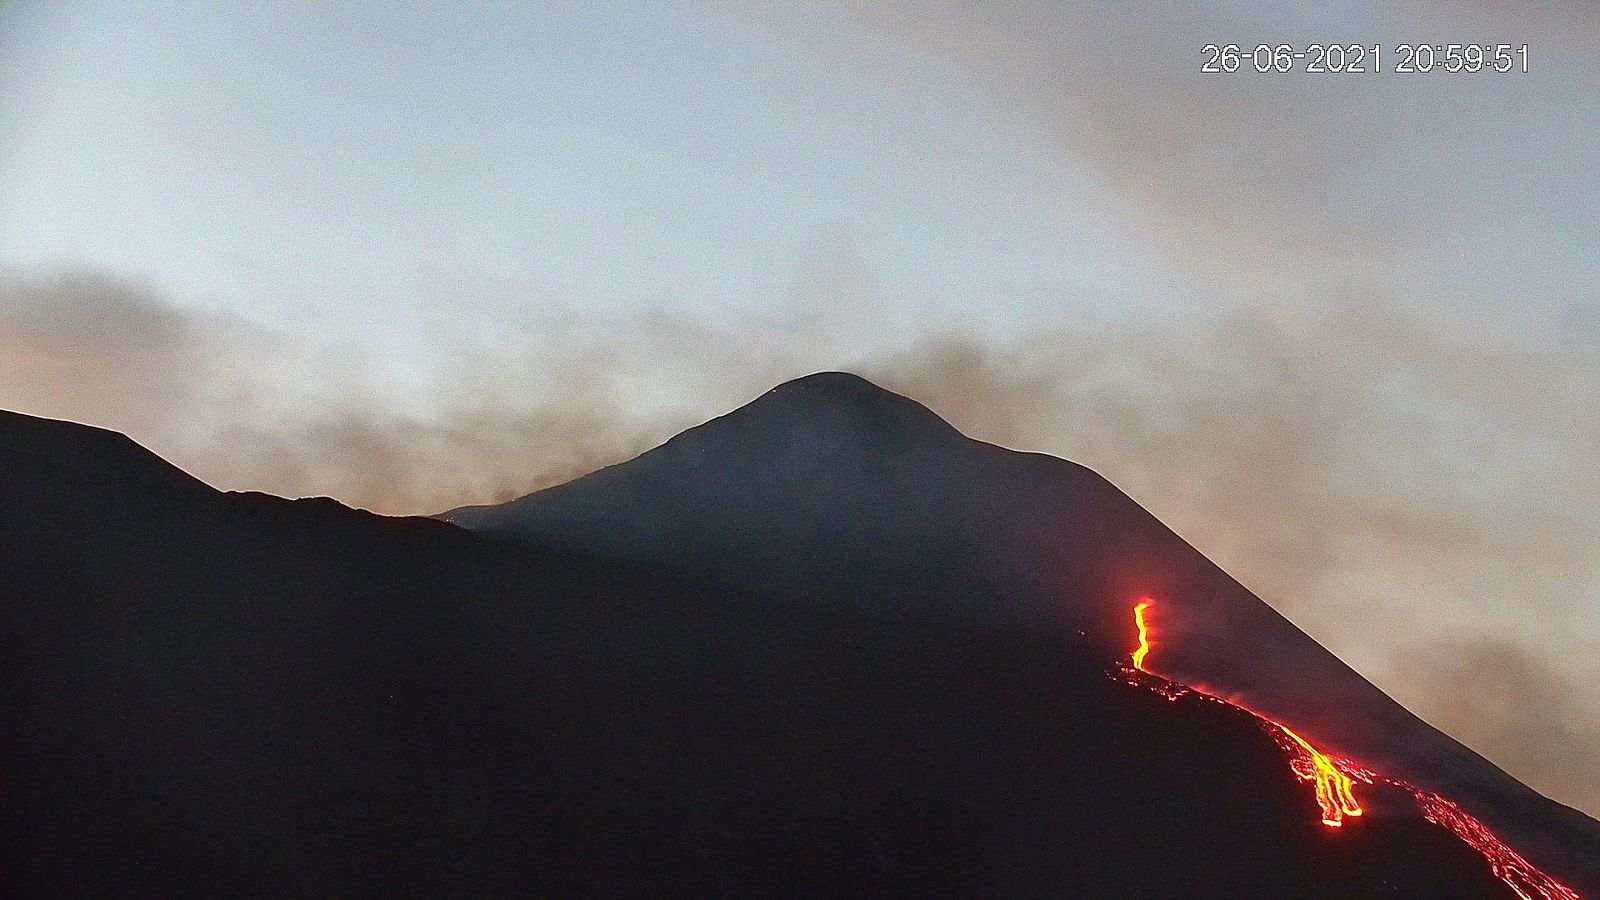 Etna SEC - 26.06.2021 / 20h59 - new webcam LAVE